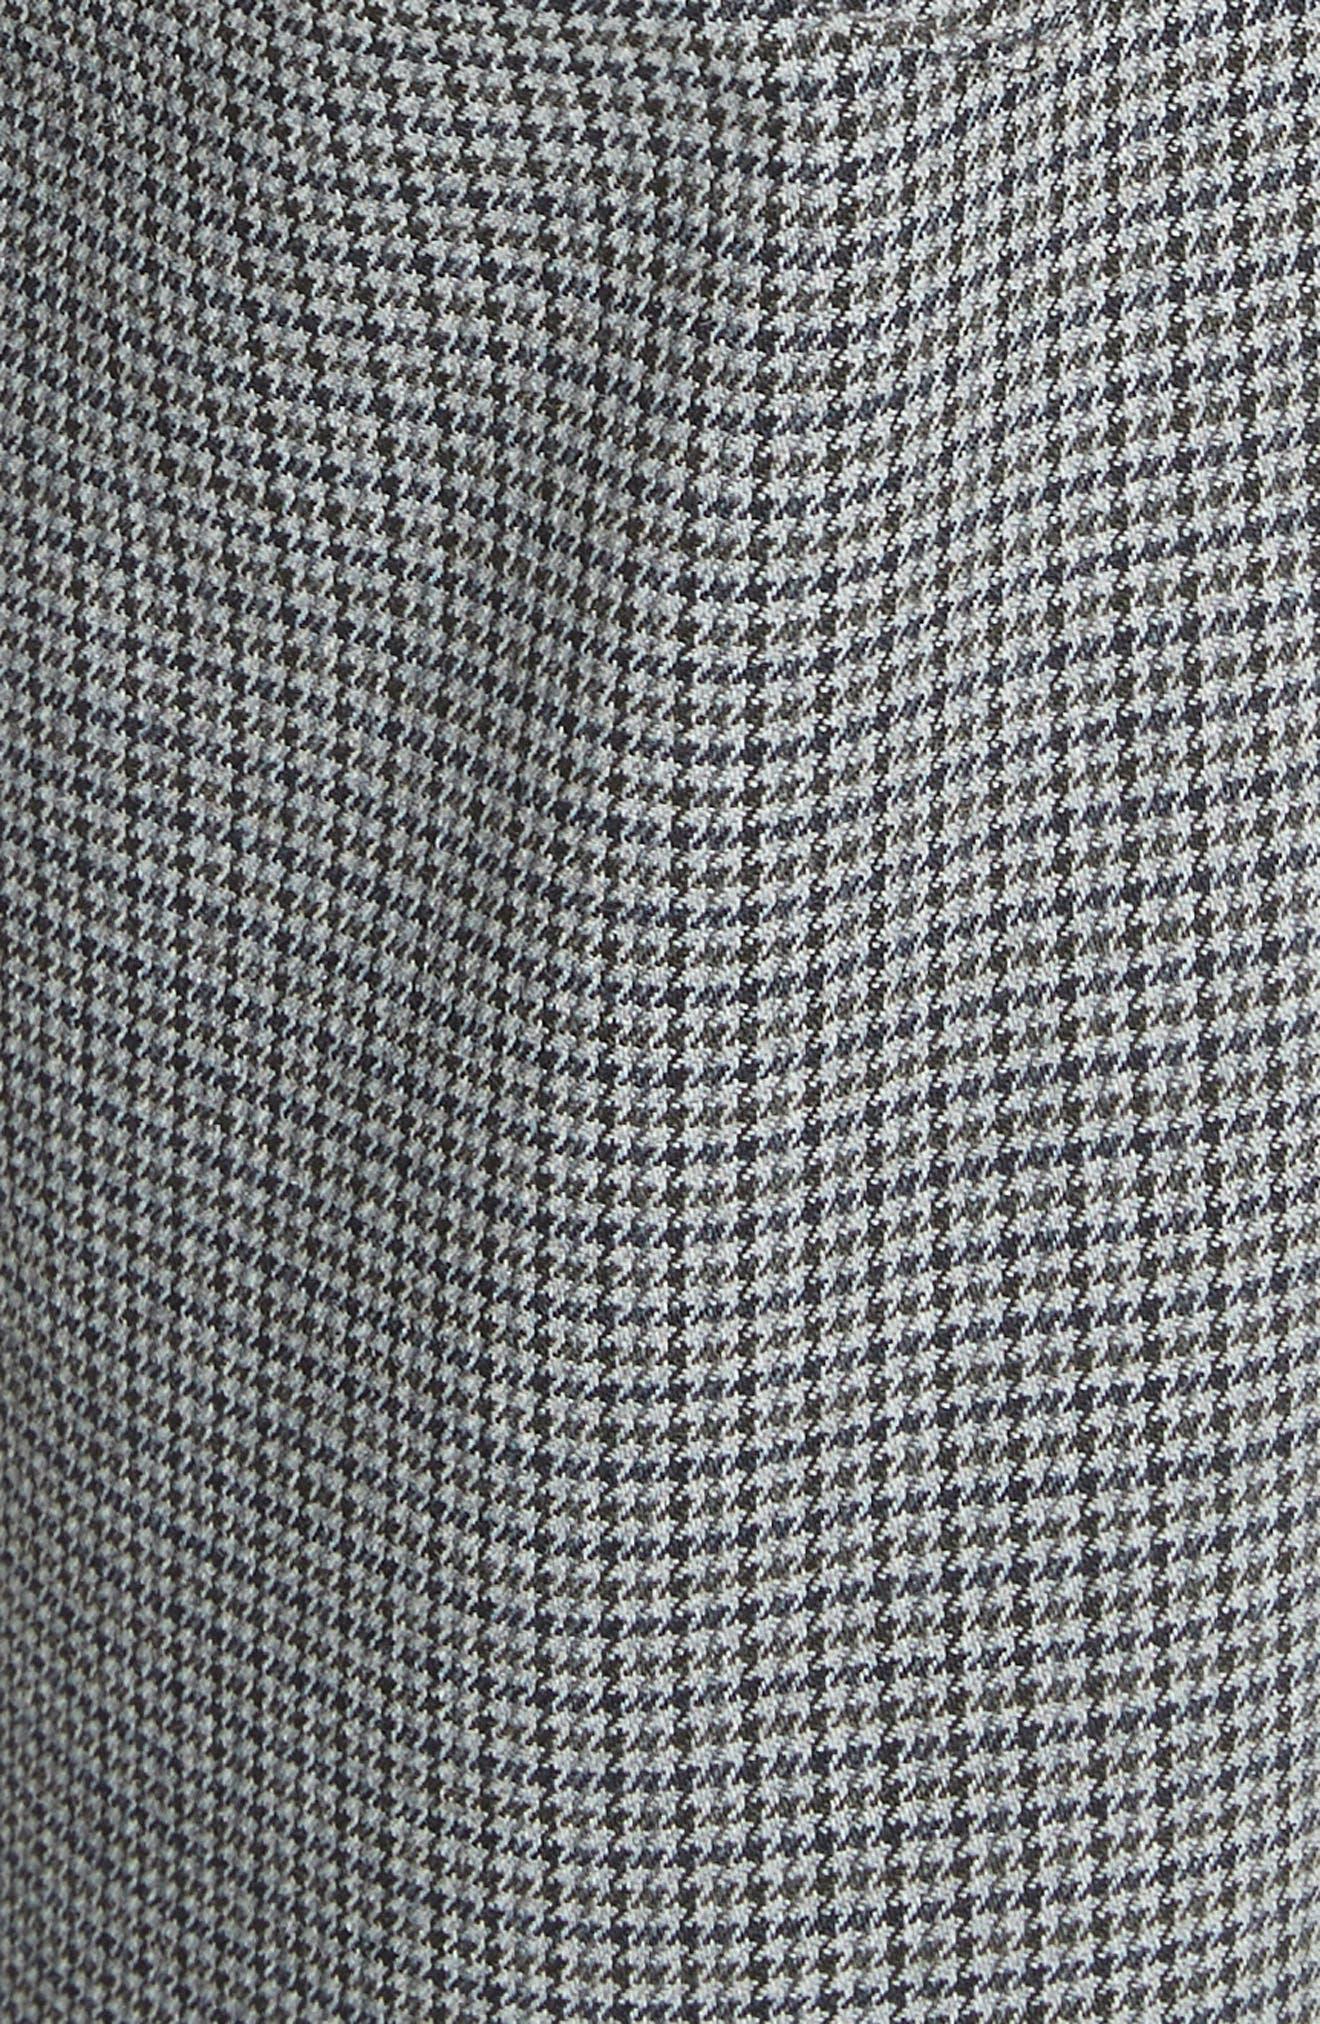 ALEXANDER WANG,                             Skinny Plaid Pants,                             Alternate thumbnail 5, color,                             020